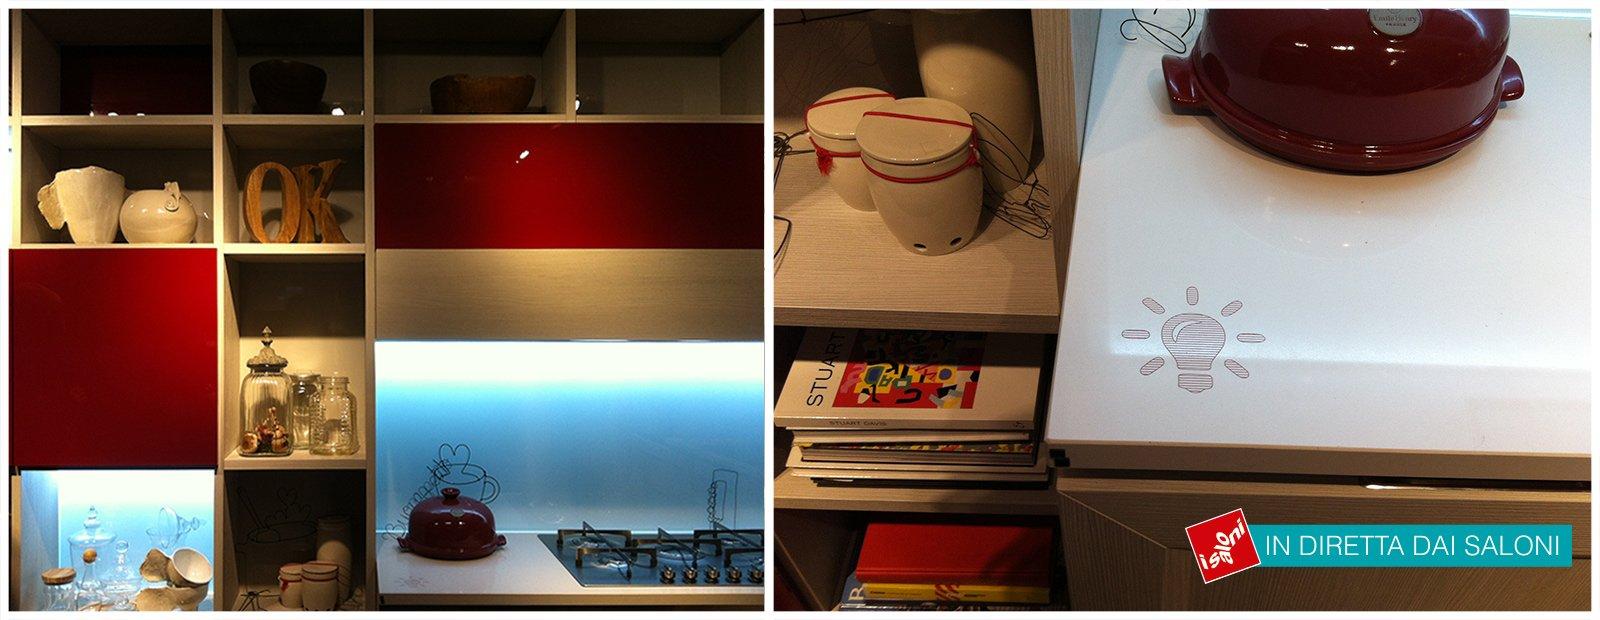 Foto montaggio veneta cucine cose di casa - Veneta cucine foto ...